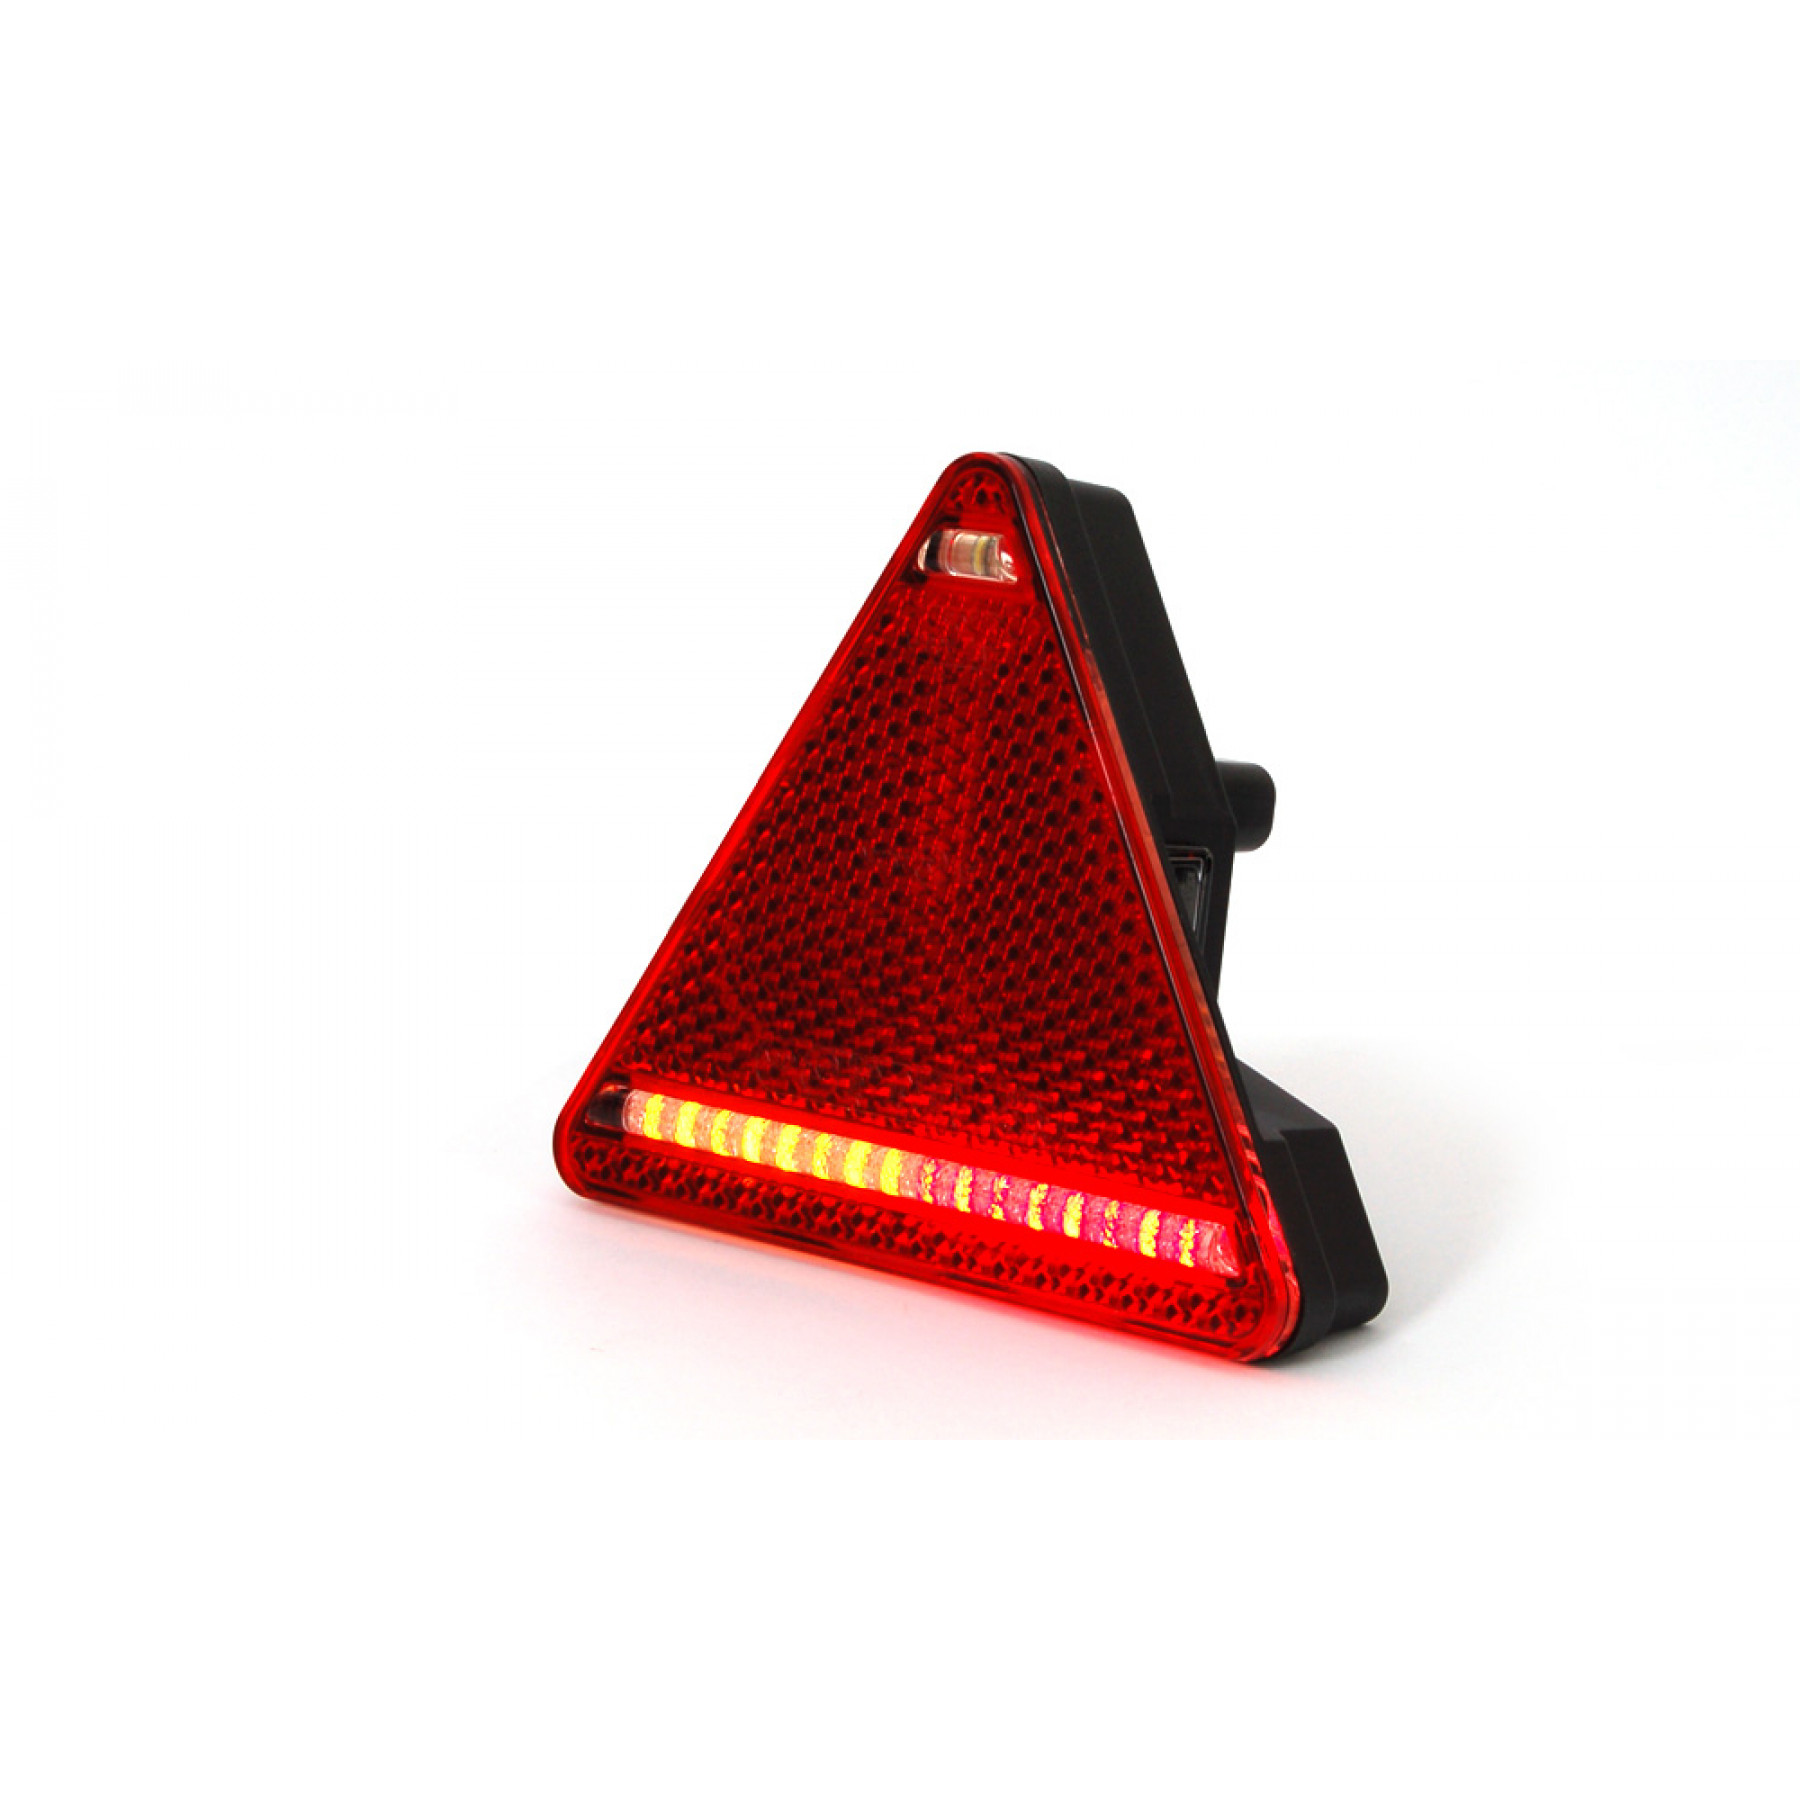 Driehoek achterlicht LED kabel 1,5 mtr. links